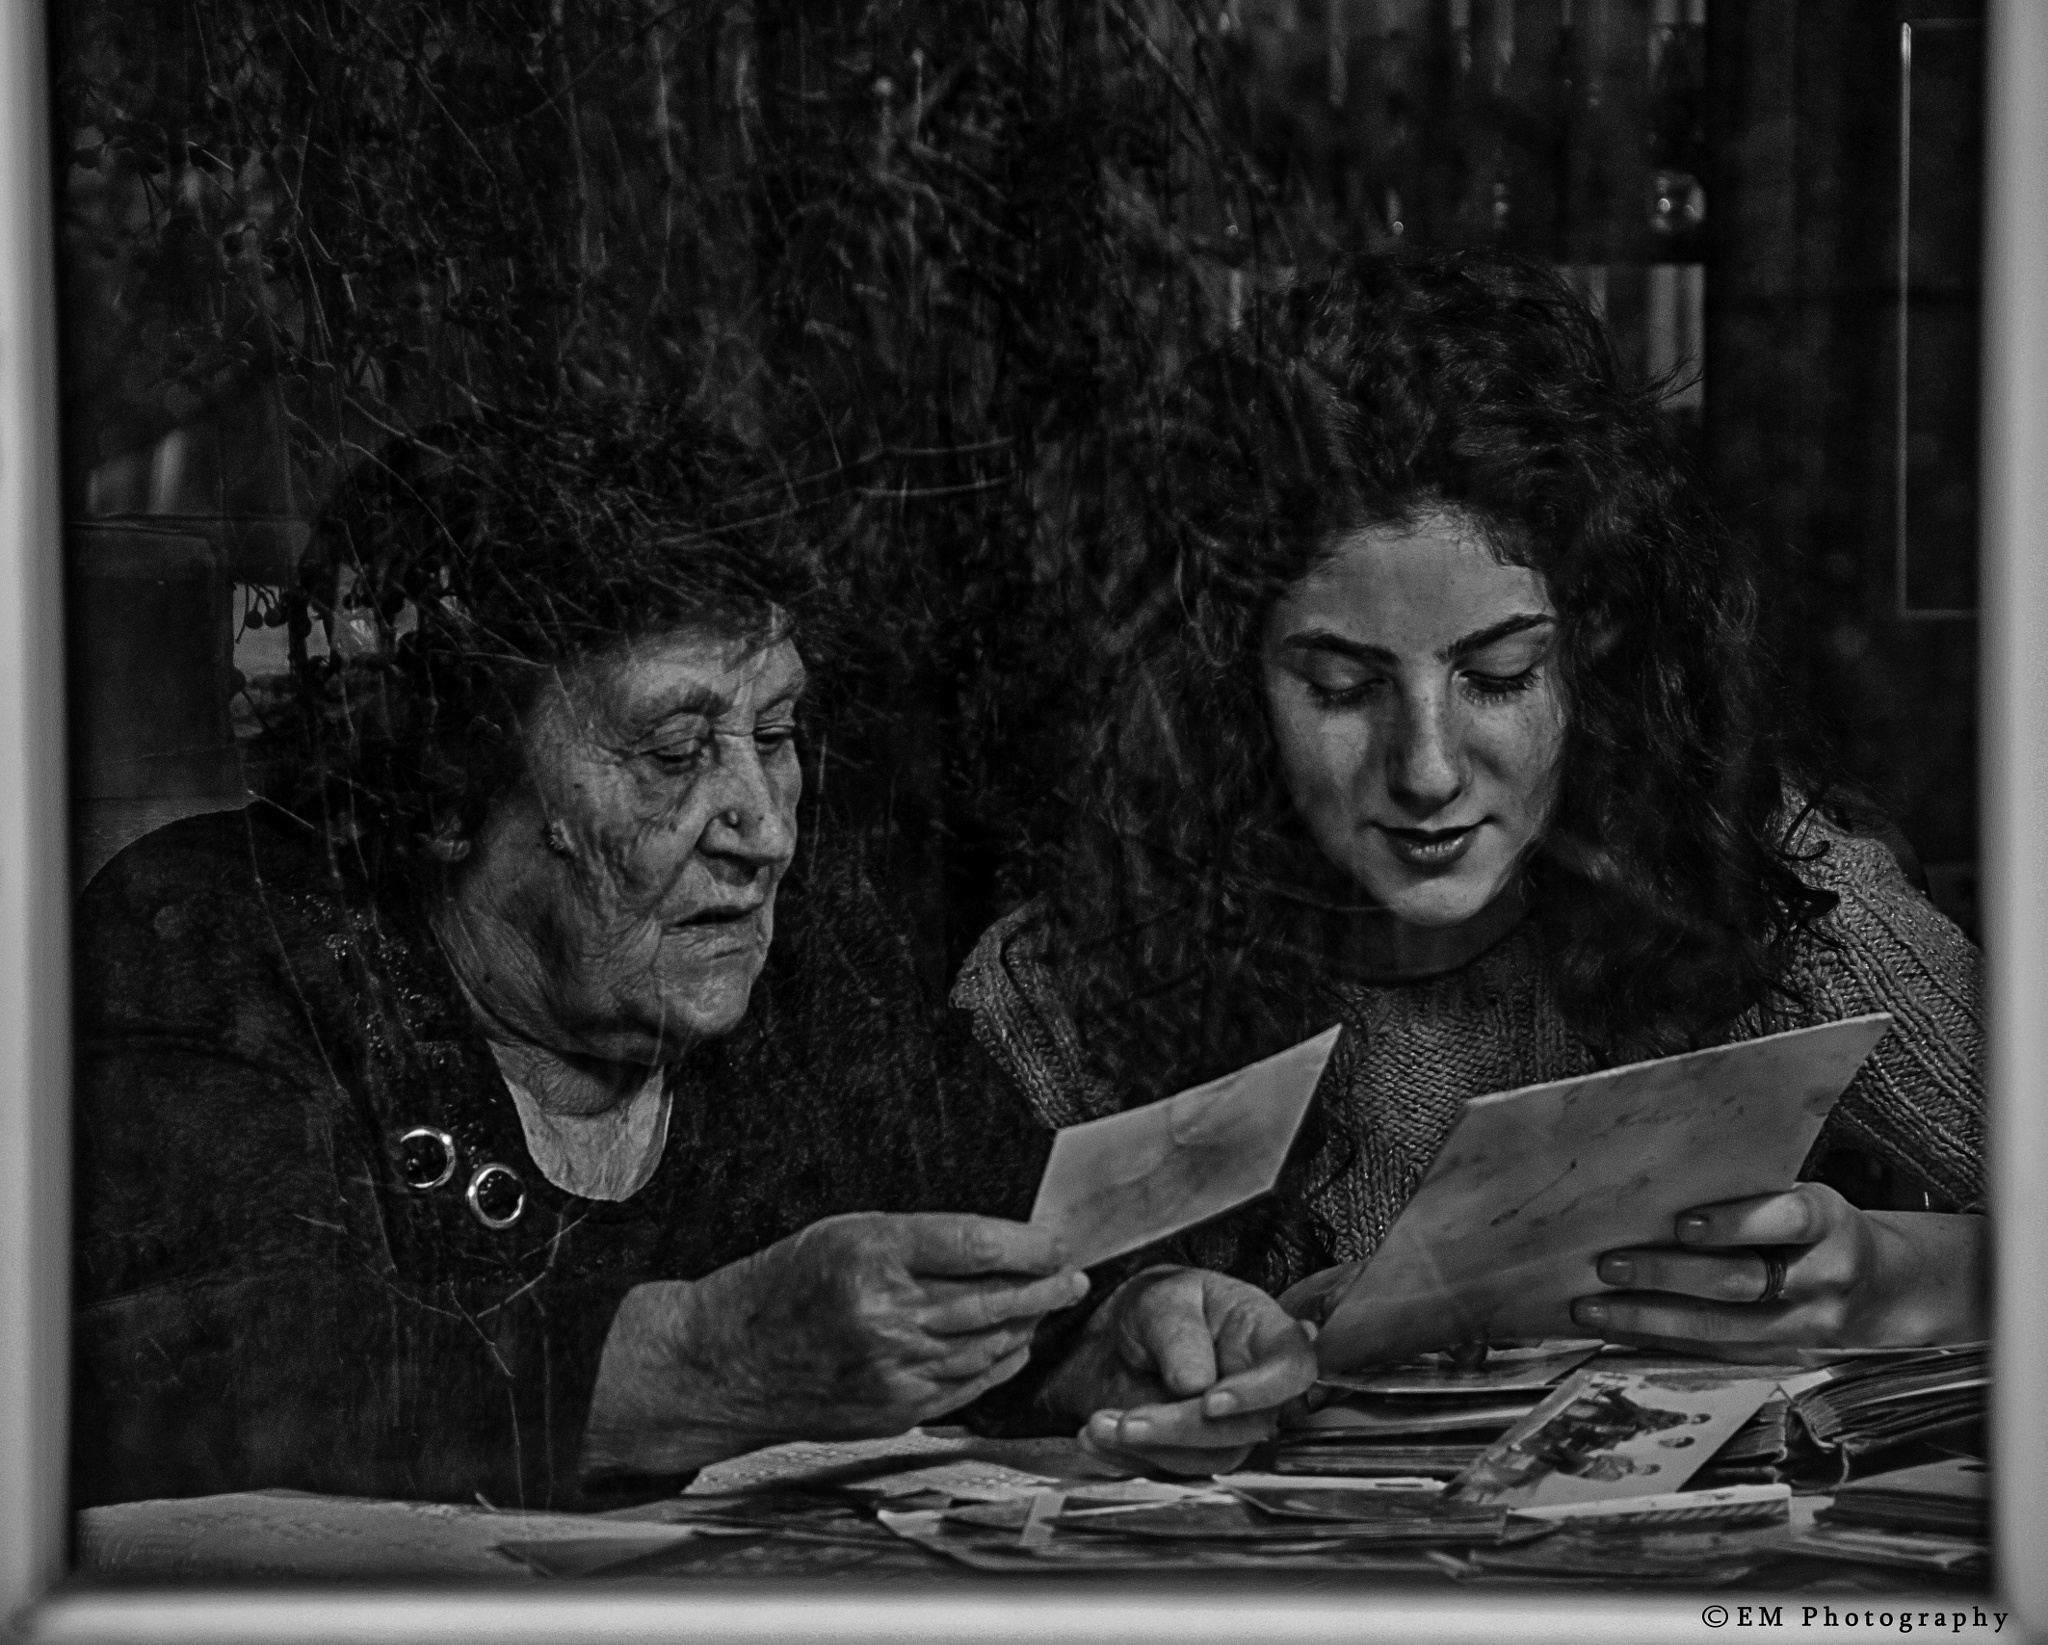 A family story by Edgar Martirosyan